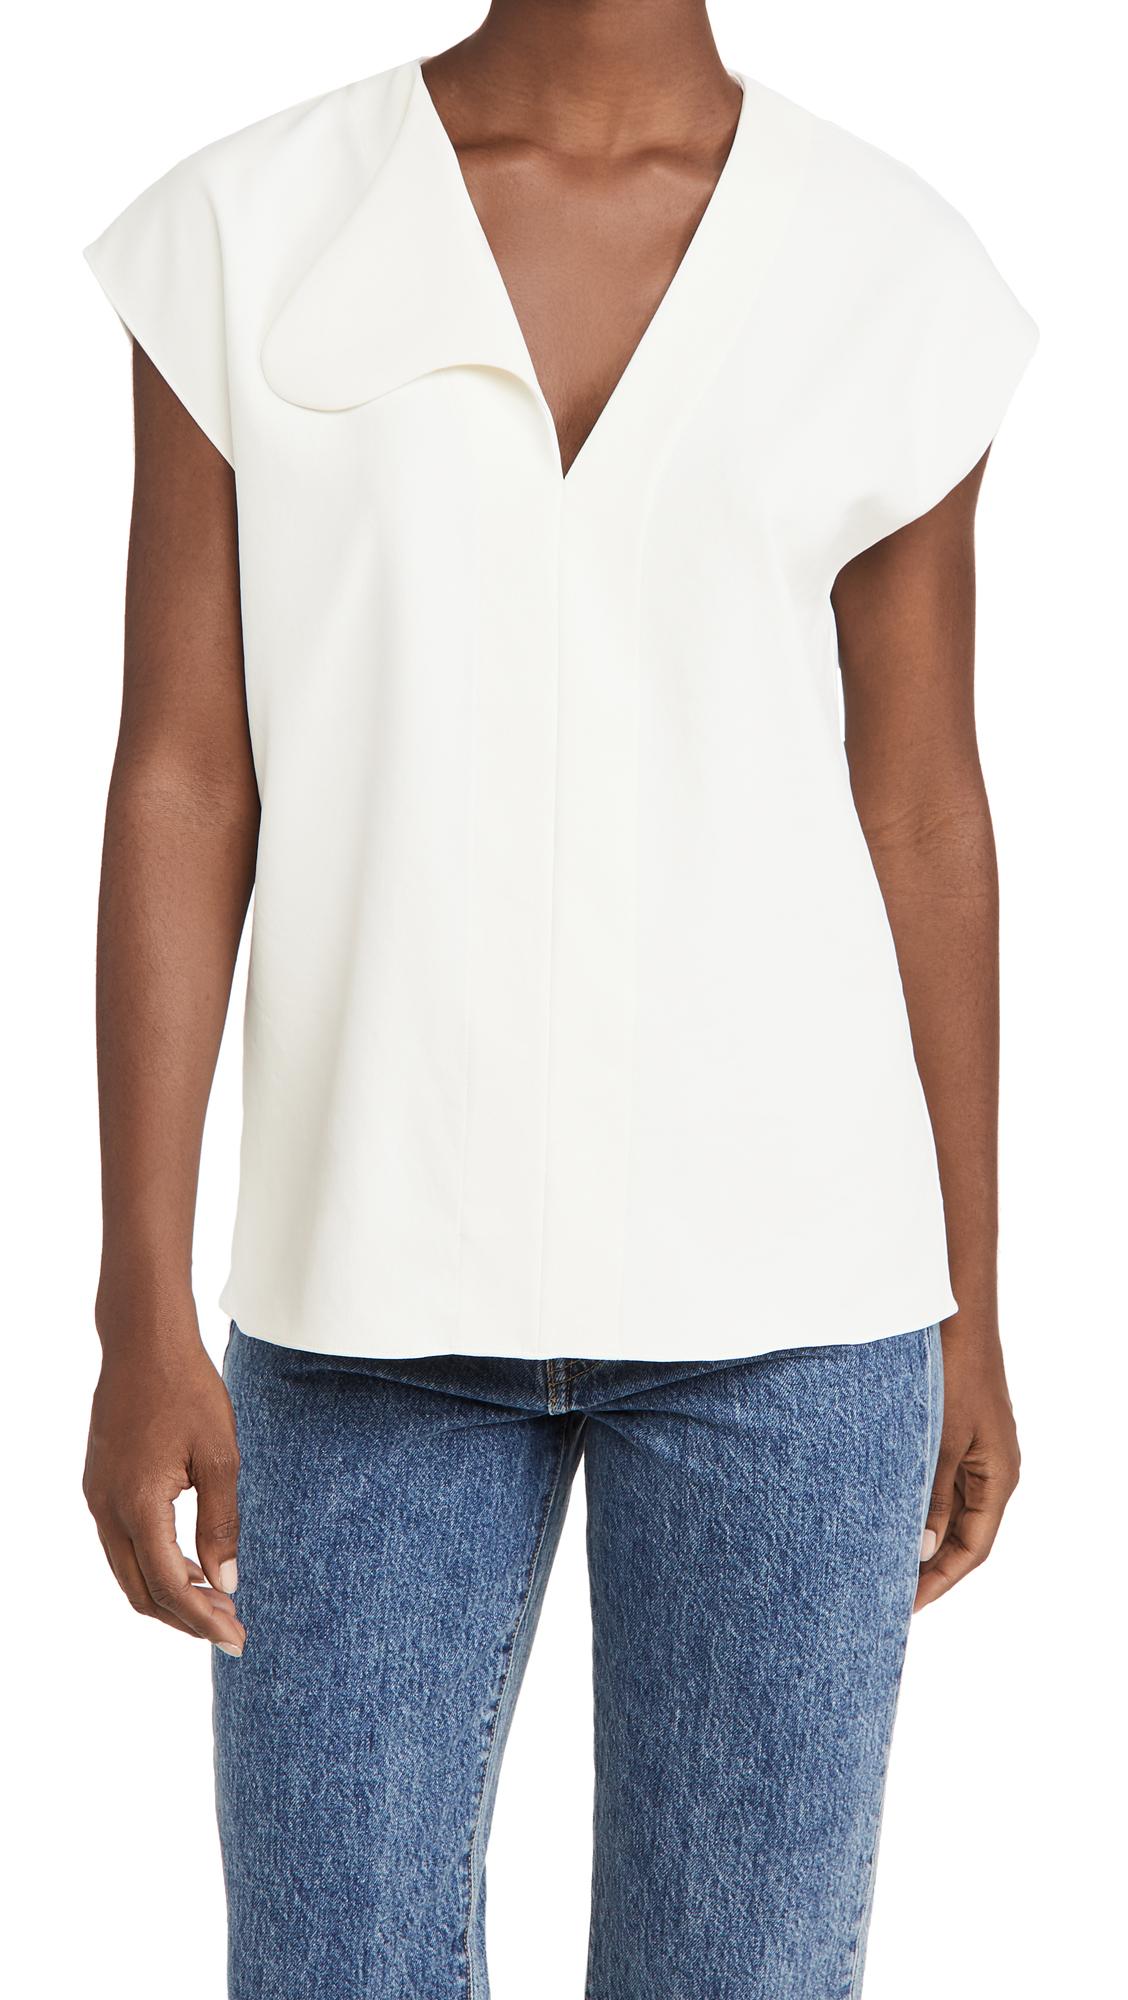 Tibi Asymmetrical Flap Easy Top